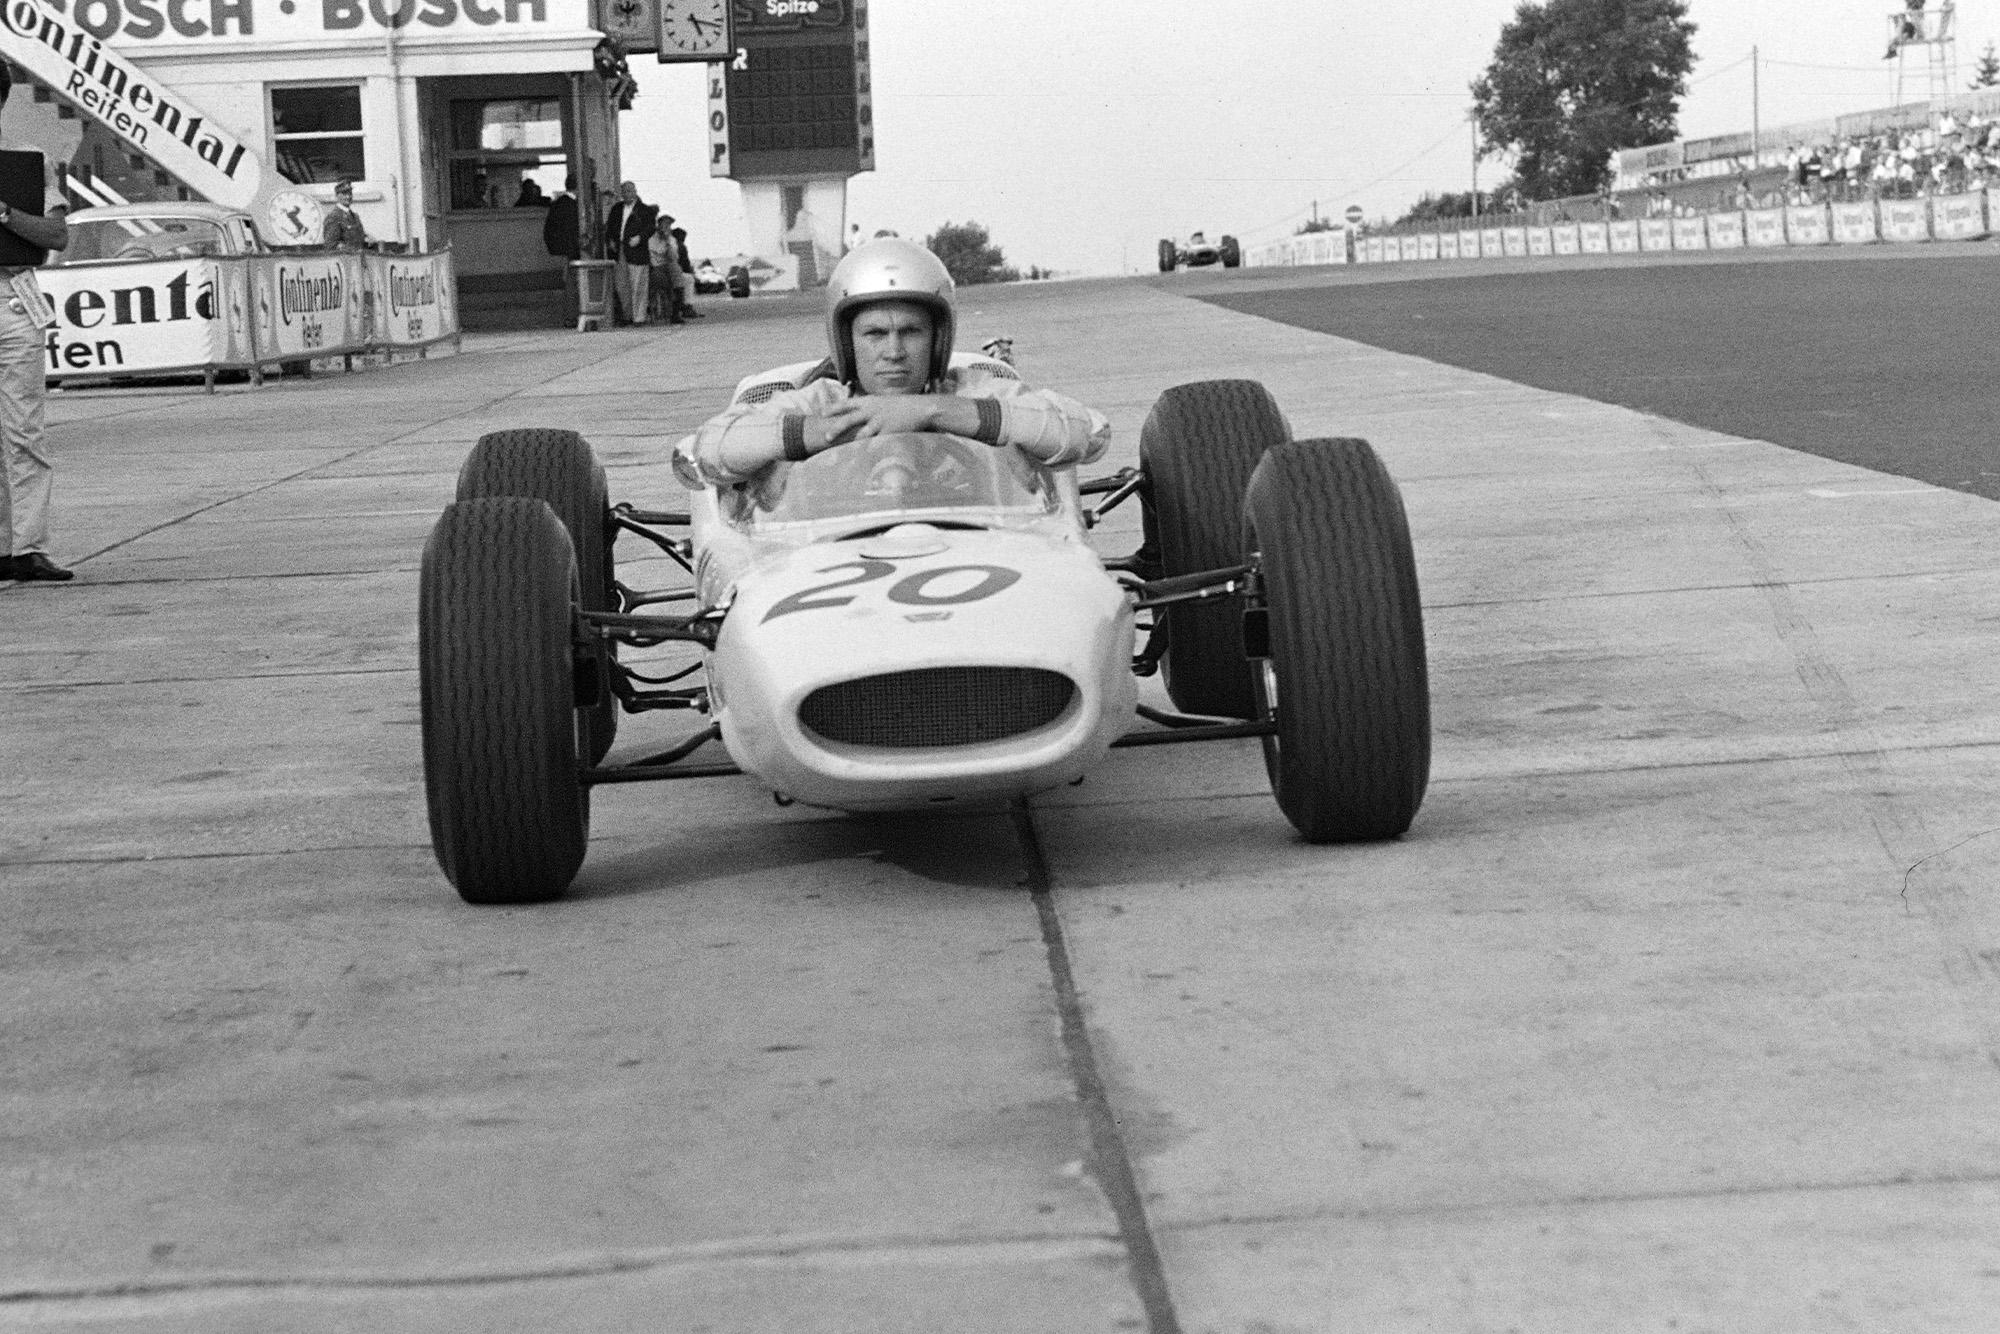 1954 German GP Bucknum